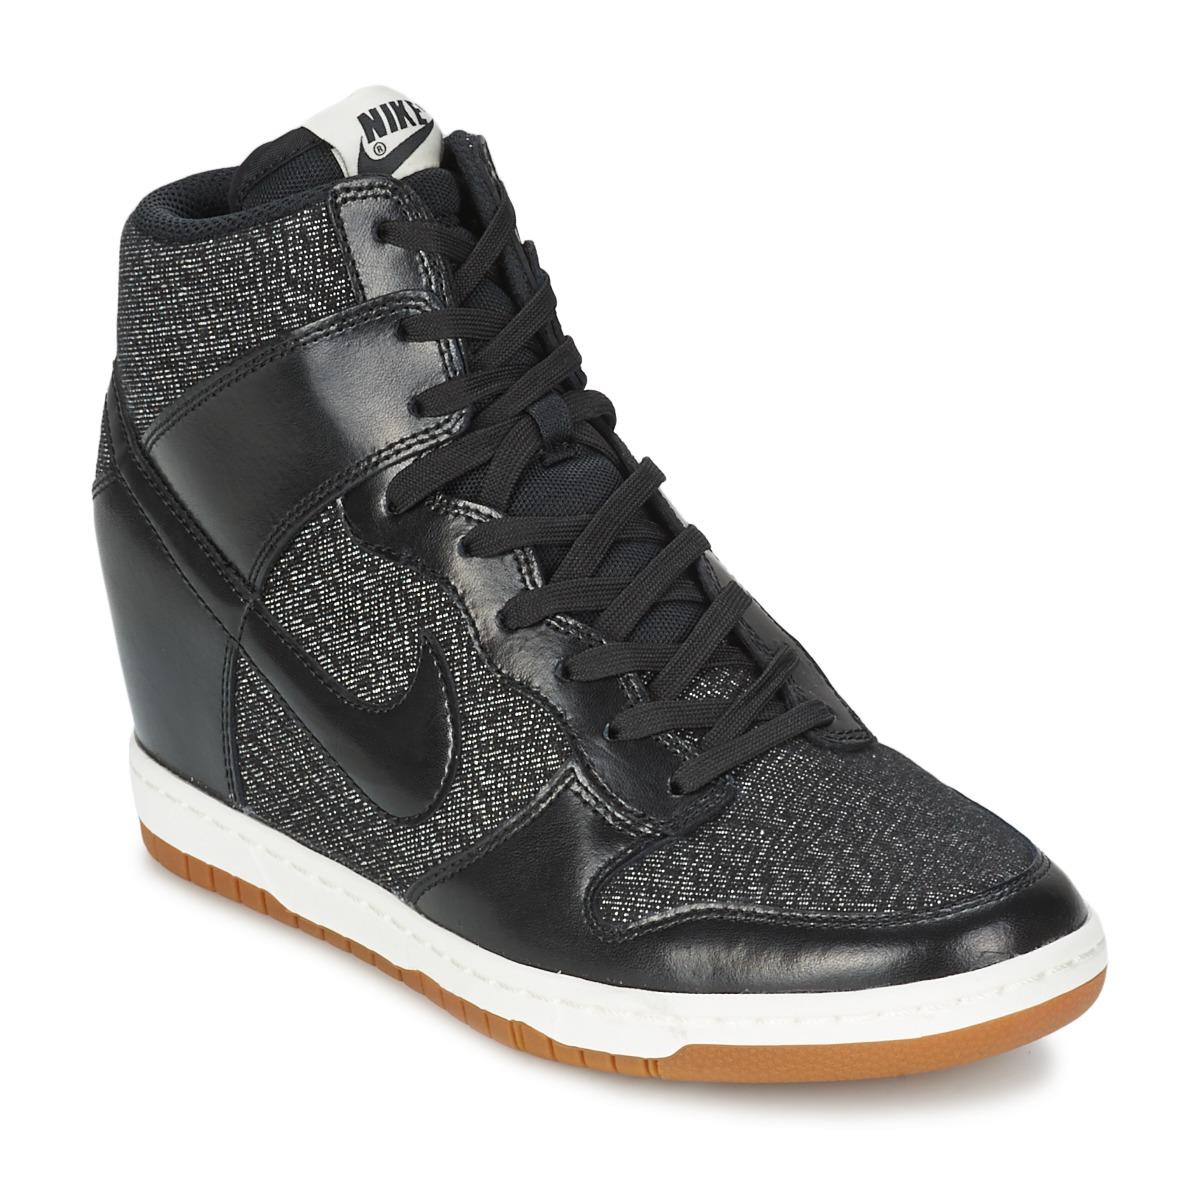 Baskets montantes Nike DUNK SKY HI ESSENTIAL Noir Noir